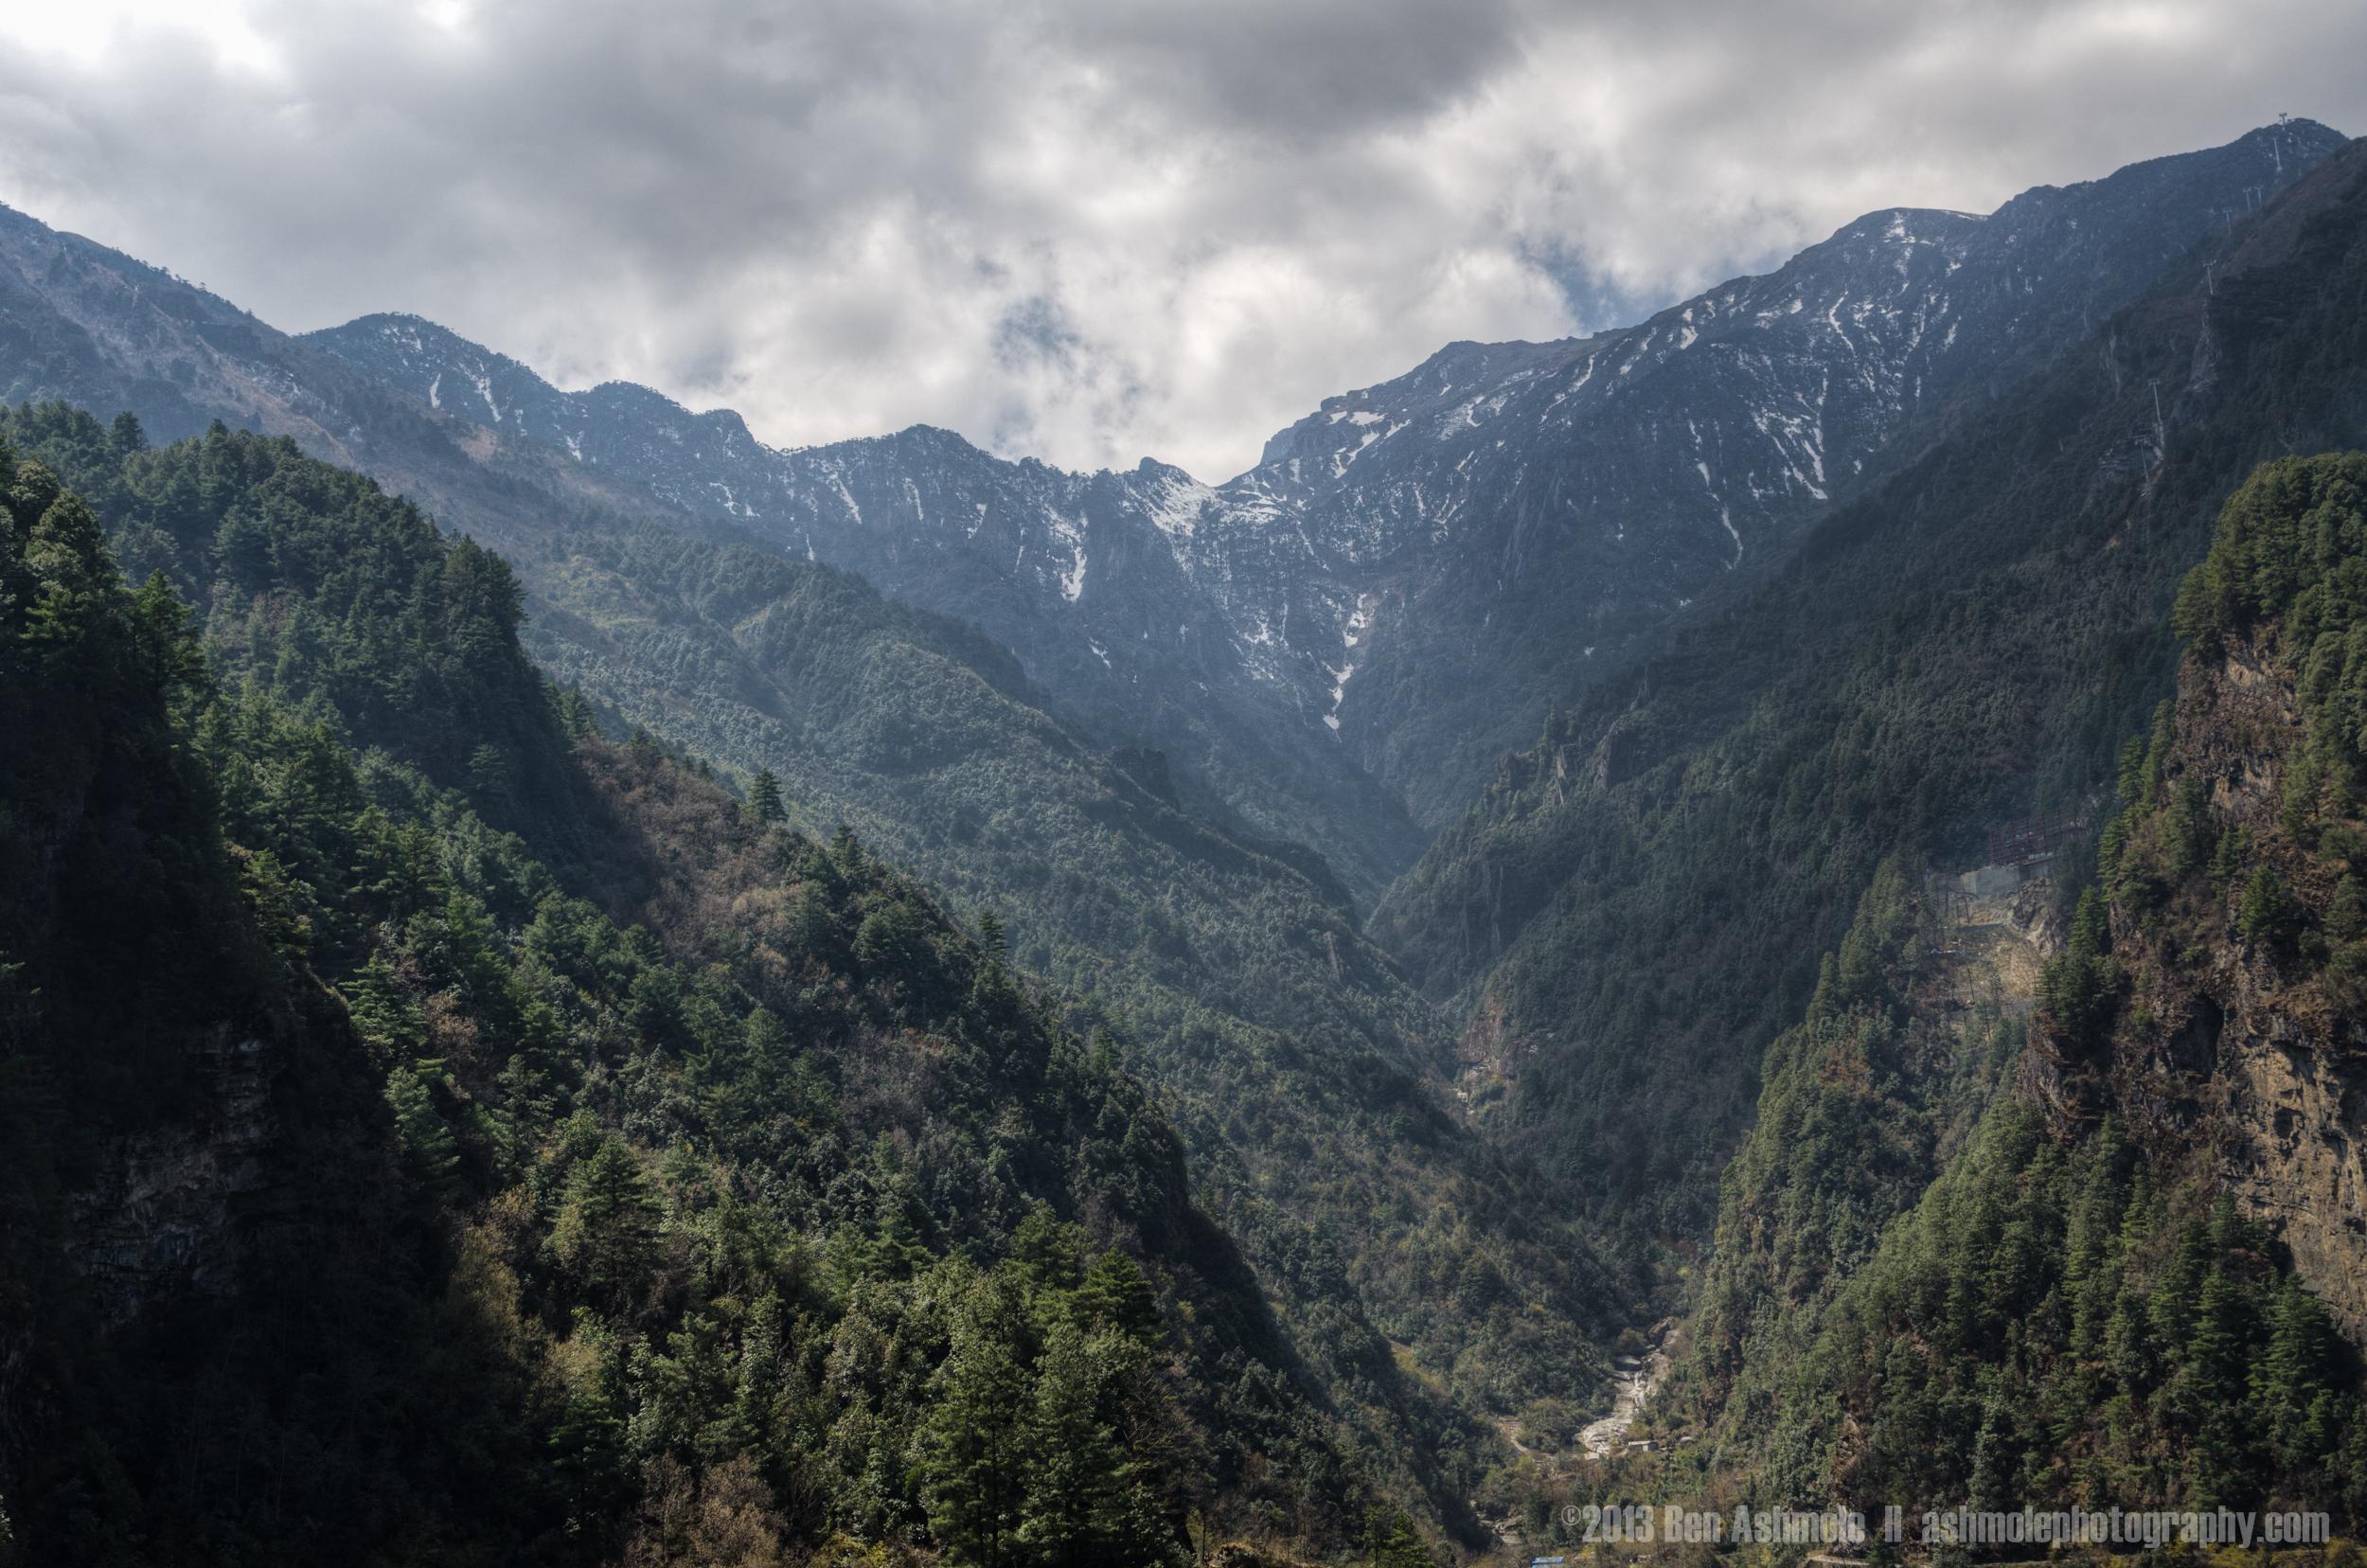 The Cangshan Mountains, Yunnan Province, China